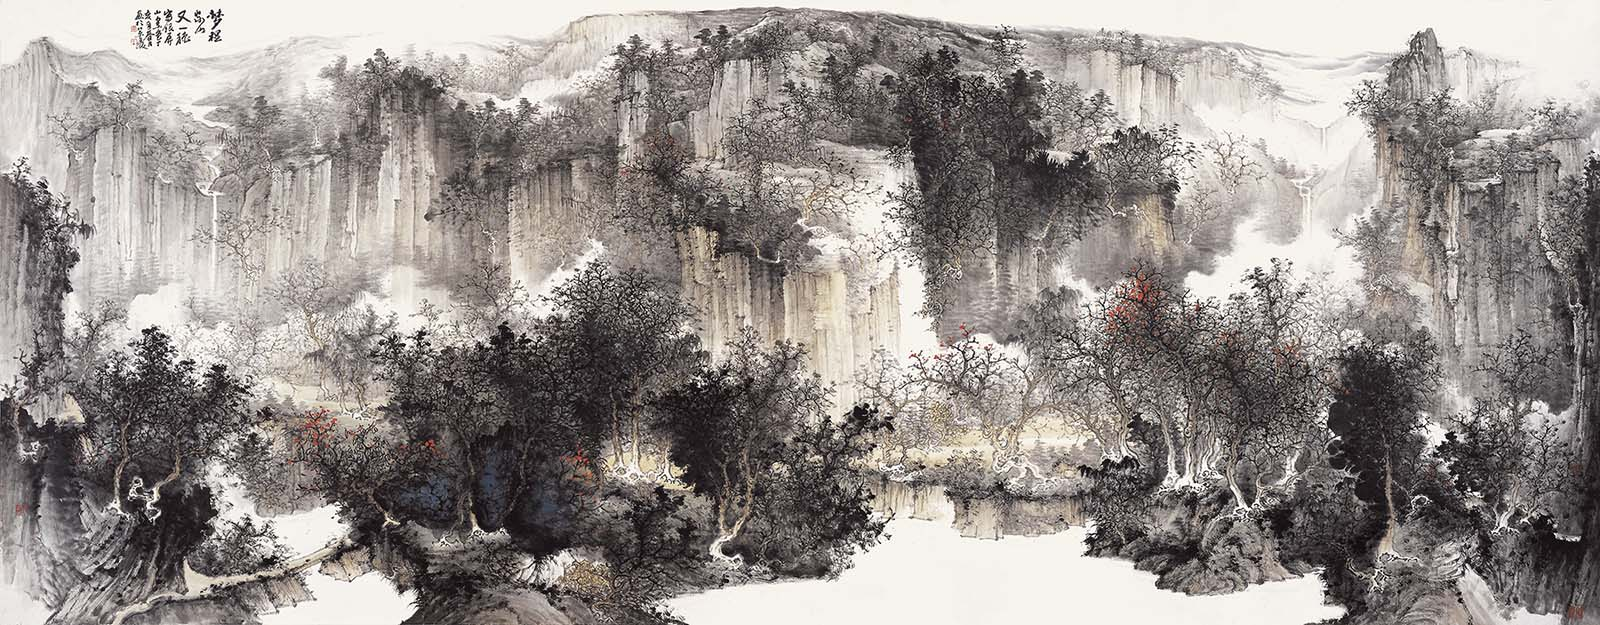 216x144cm 周逢俊的山水画以纯水墨或浅绛山水为主,诗情氤氲,古意盎然。古代画家往往写他的家乡山水,因而形成了他自己独到的风格和技巧。(黄宾虹语)周逢俊曾经游览过祖国各地的名山大川,家乡的山水仍然是他的最爱。他说:我的画多半取自家乡的山水题材。若不描绘自己热爱、感受最深的生我养我的故乡的景色,实在是浪费。清气、野逸是我追求的风格。(《松韵堂访谈录》)他的山水画《梦里家山又一秋》、《家在银屏云水间》、《家山秋之韵》、《秋崖隐读图》、《故乡诗意》、《银屏山雾雨》等大量作品,都是描绘他的故乡的景色。